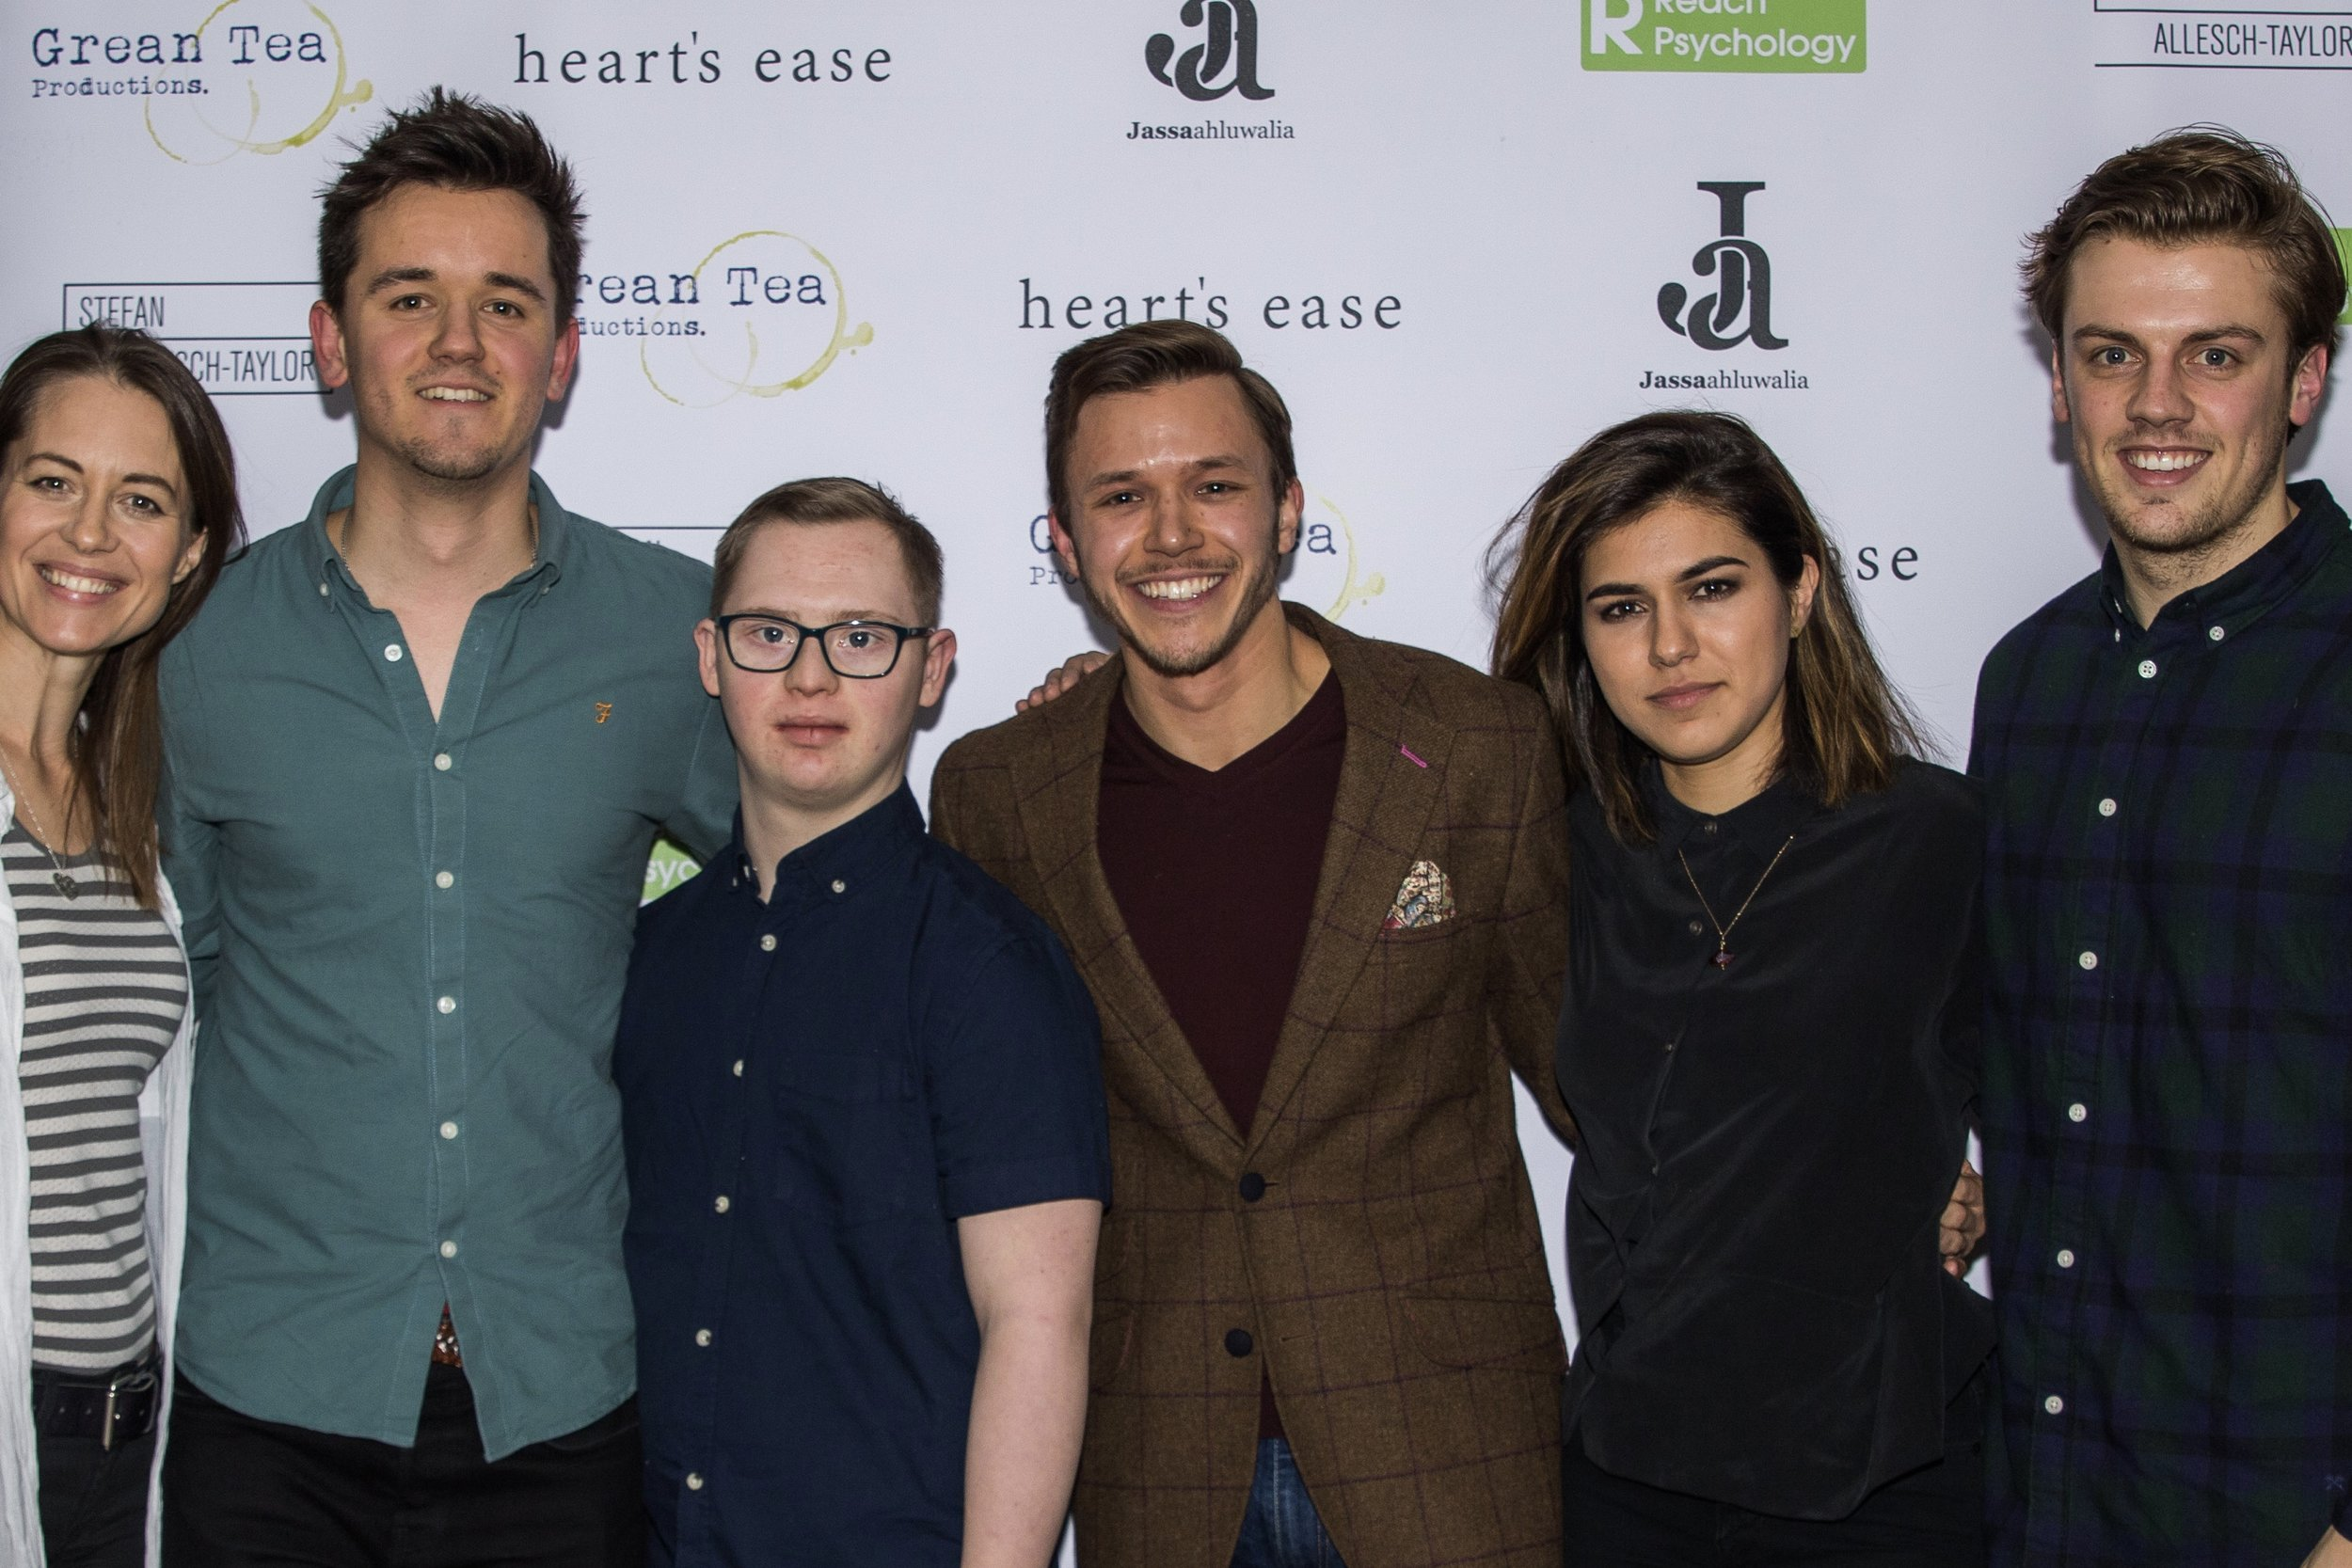 Kezia Burrows, Olly Fawcett, Tom Dann, Jassa Ahluwalia, Ramanique Ahluwalia and Matthew Marrs attend the cast and crew screening of Heart's Ease.